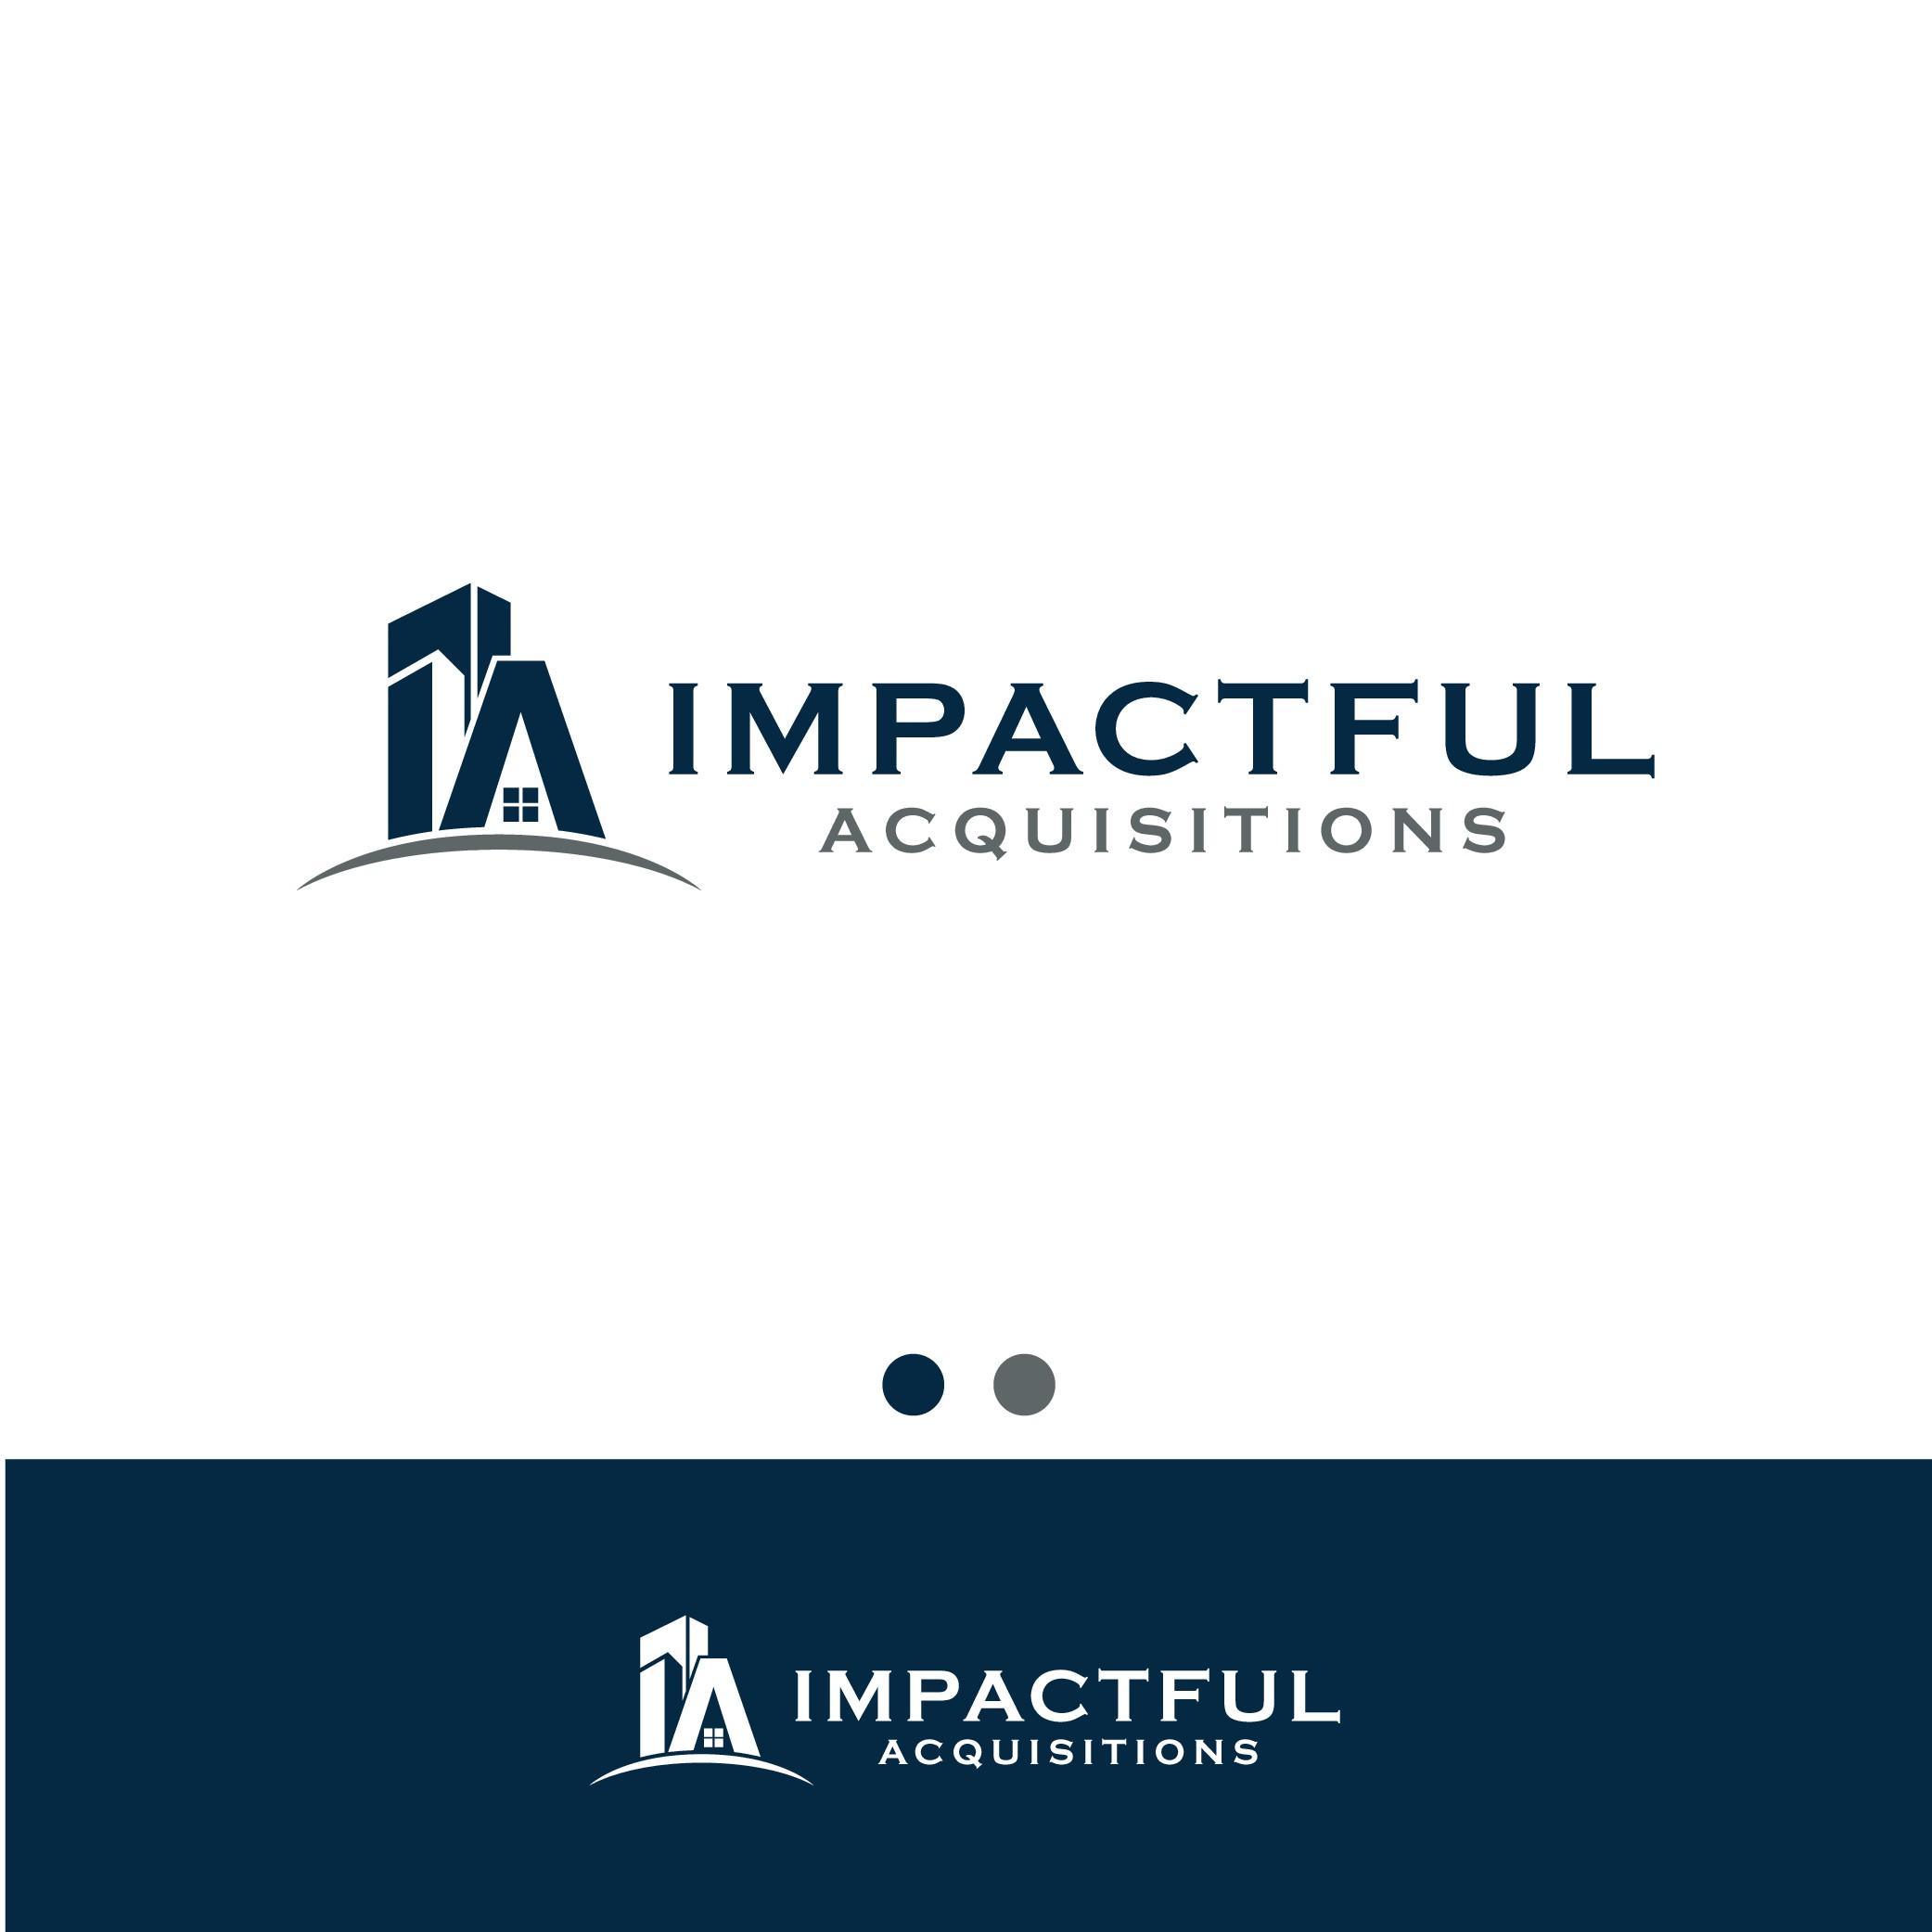 Impactful Acquisitions Logo Contest